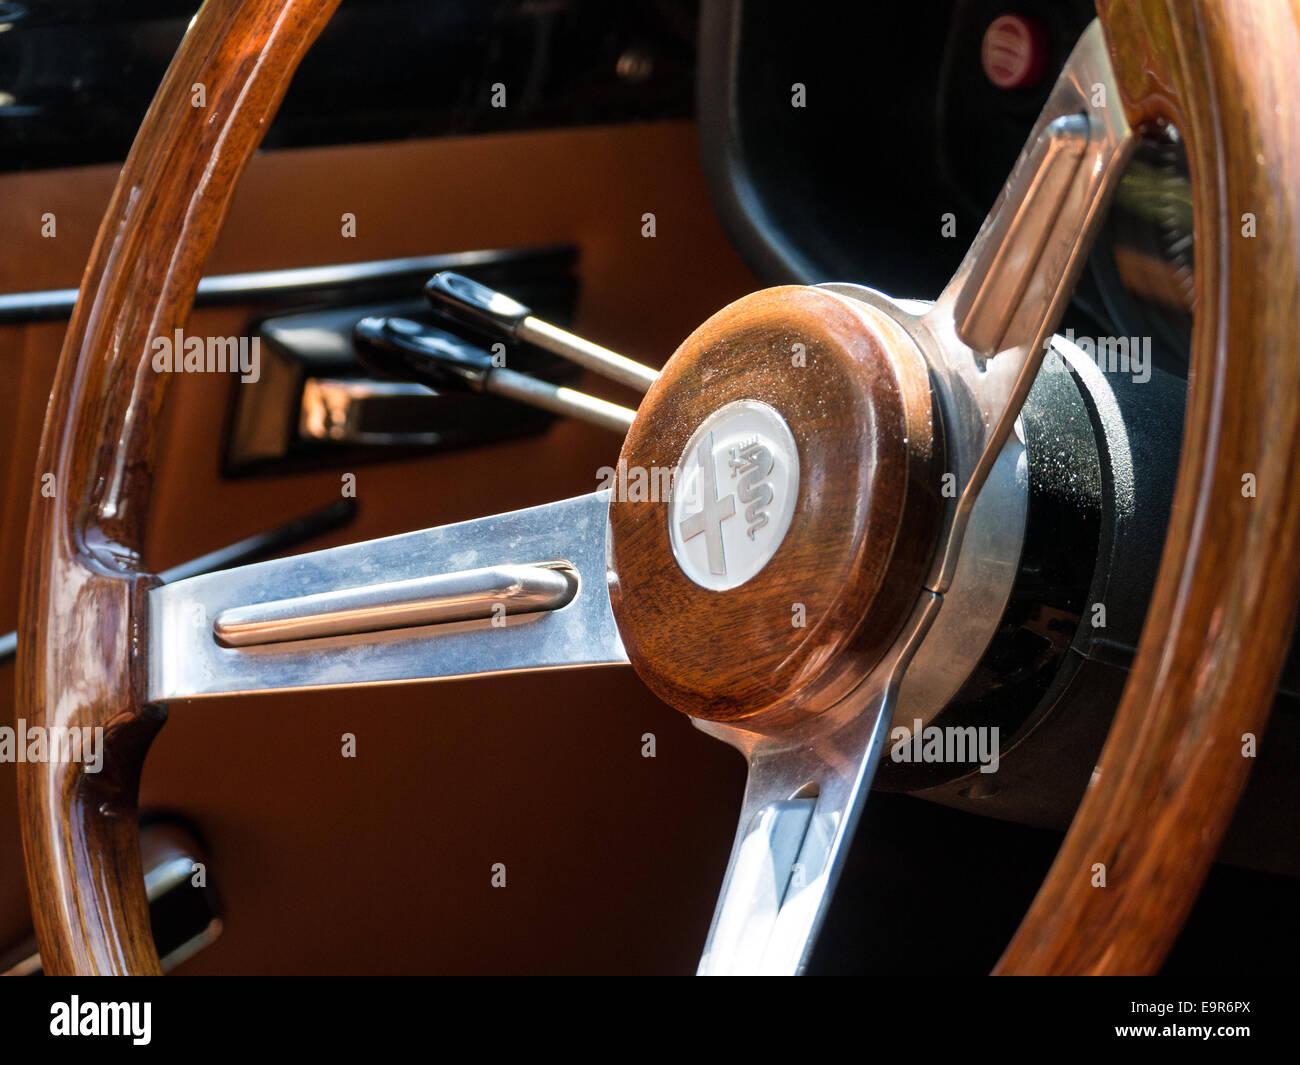 Wooden Steering Wheel In A Classic Alfa Romeo Racing Car Stock Photo